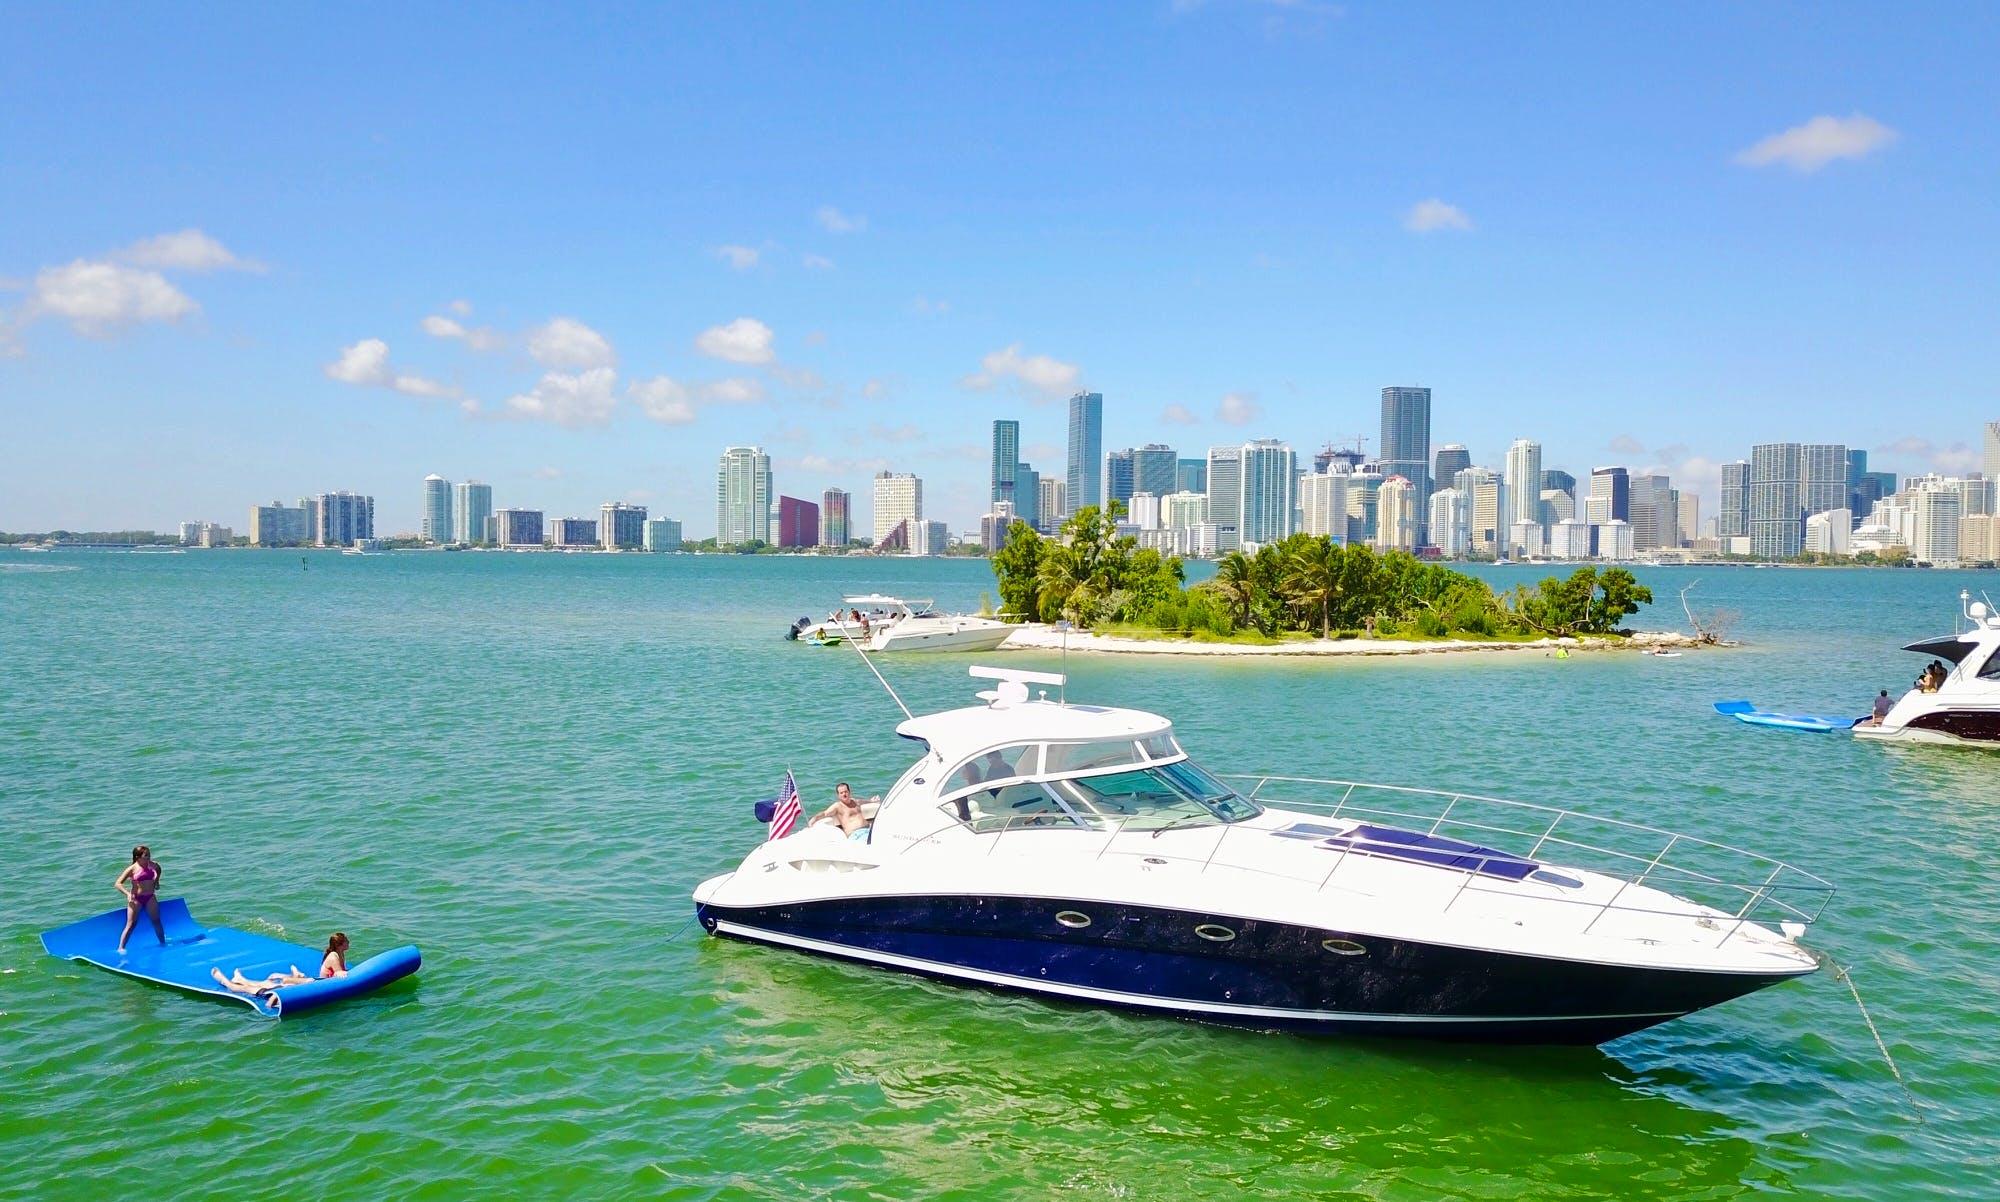 45' Sea Ray Sundancer Yacht Rental In Miami, Florida